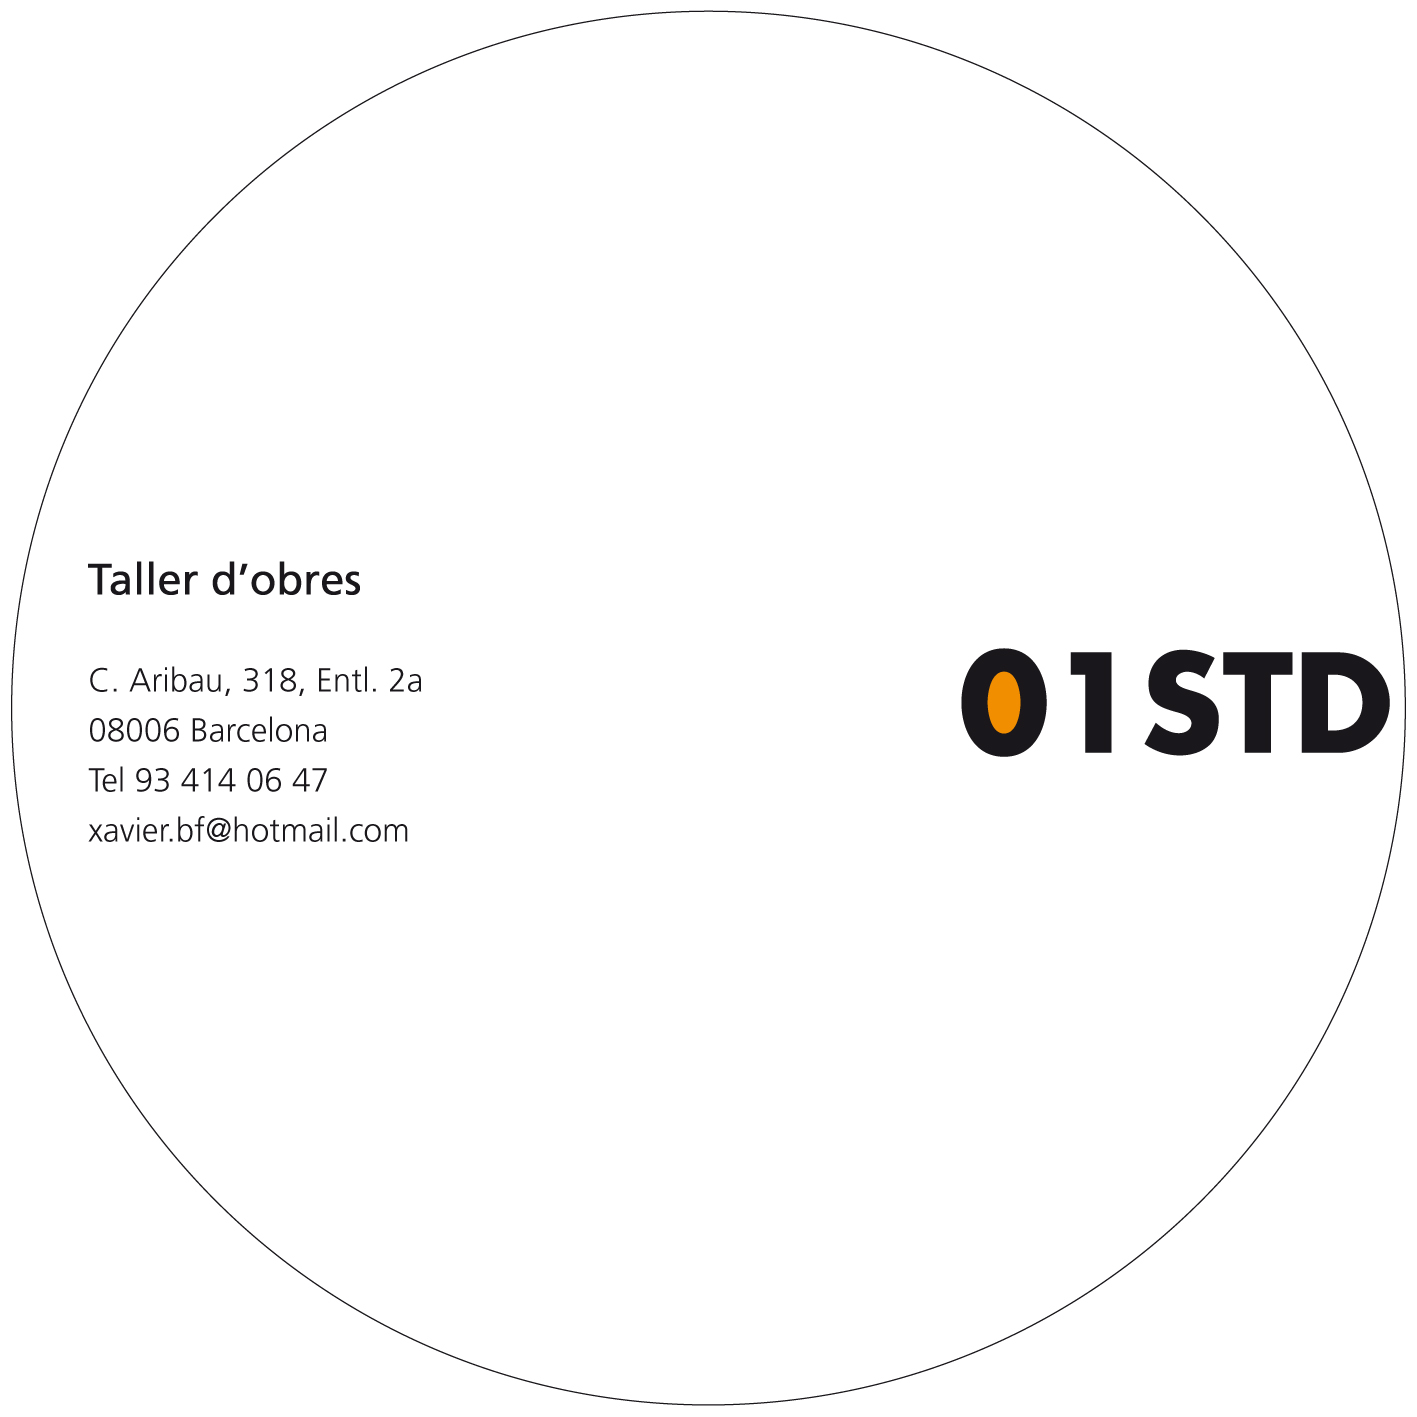 Taller De Obras 01std